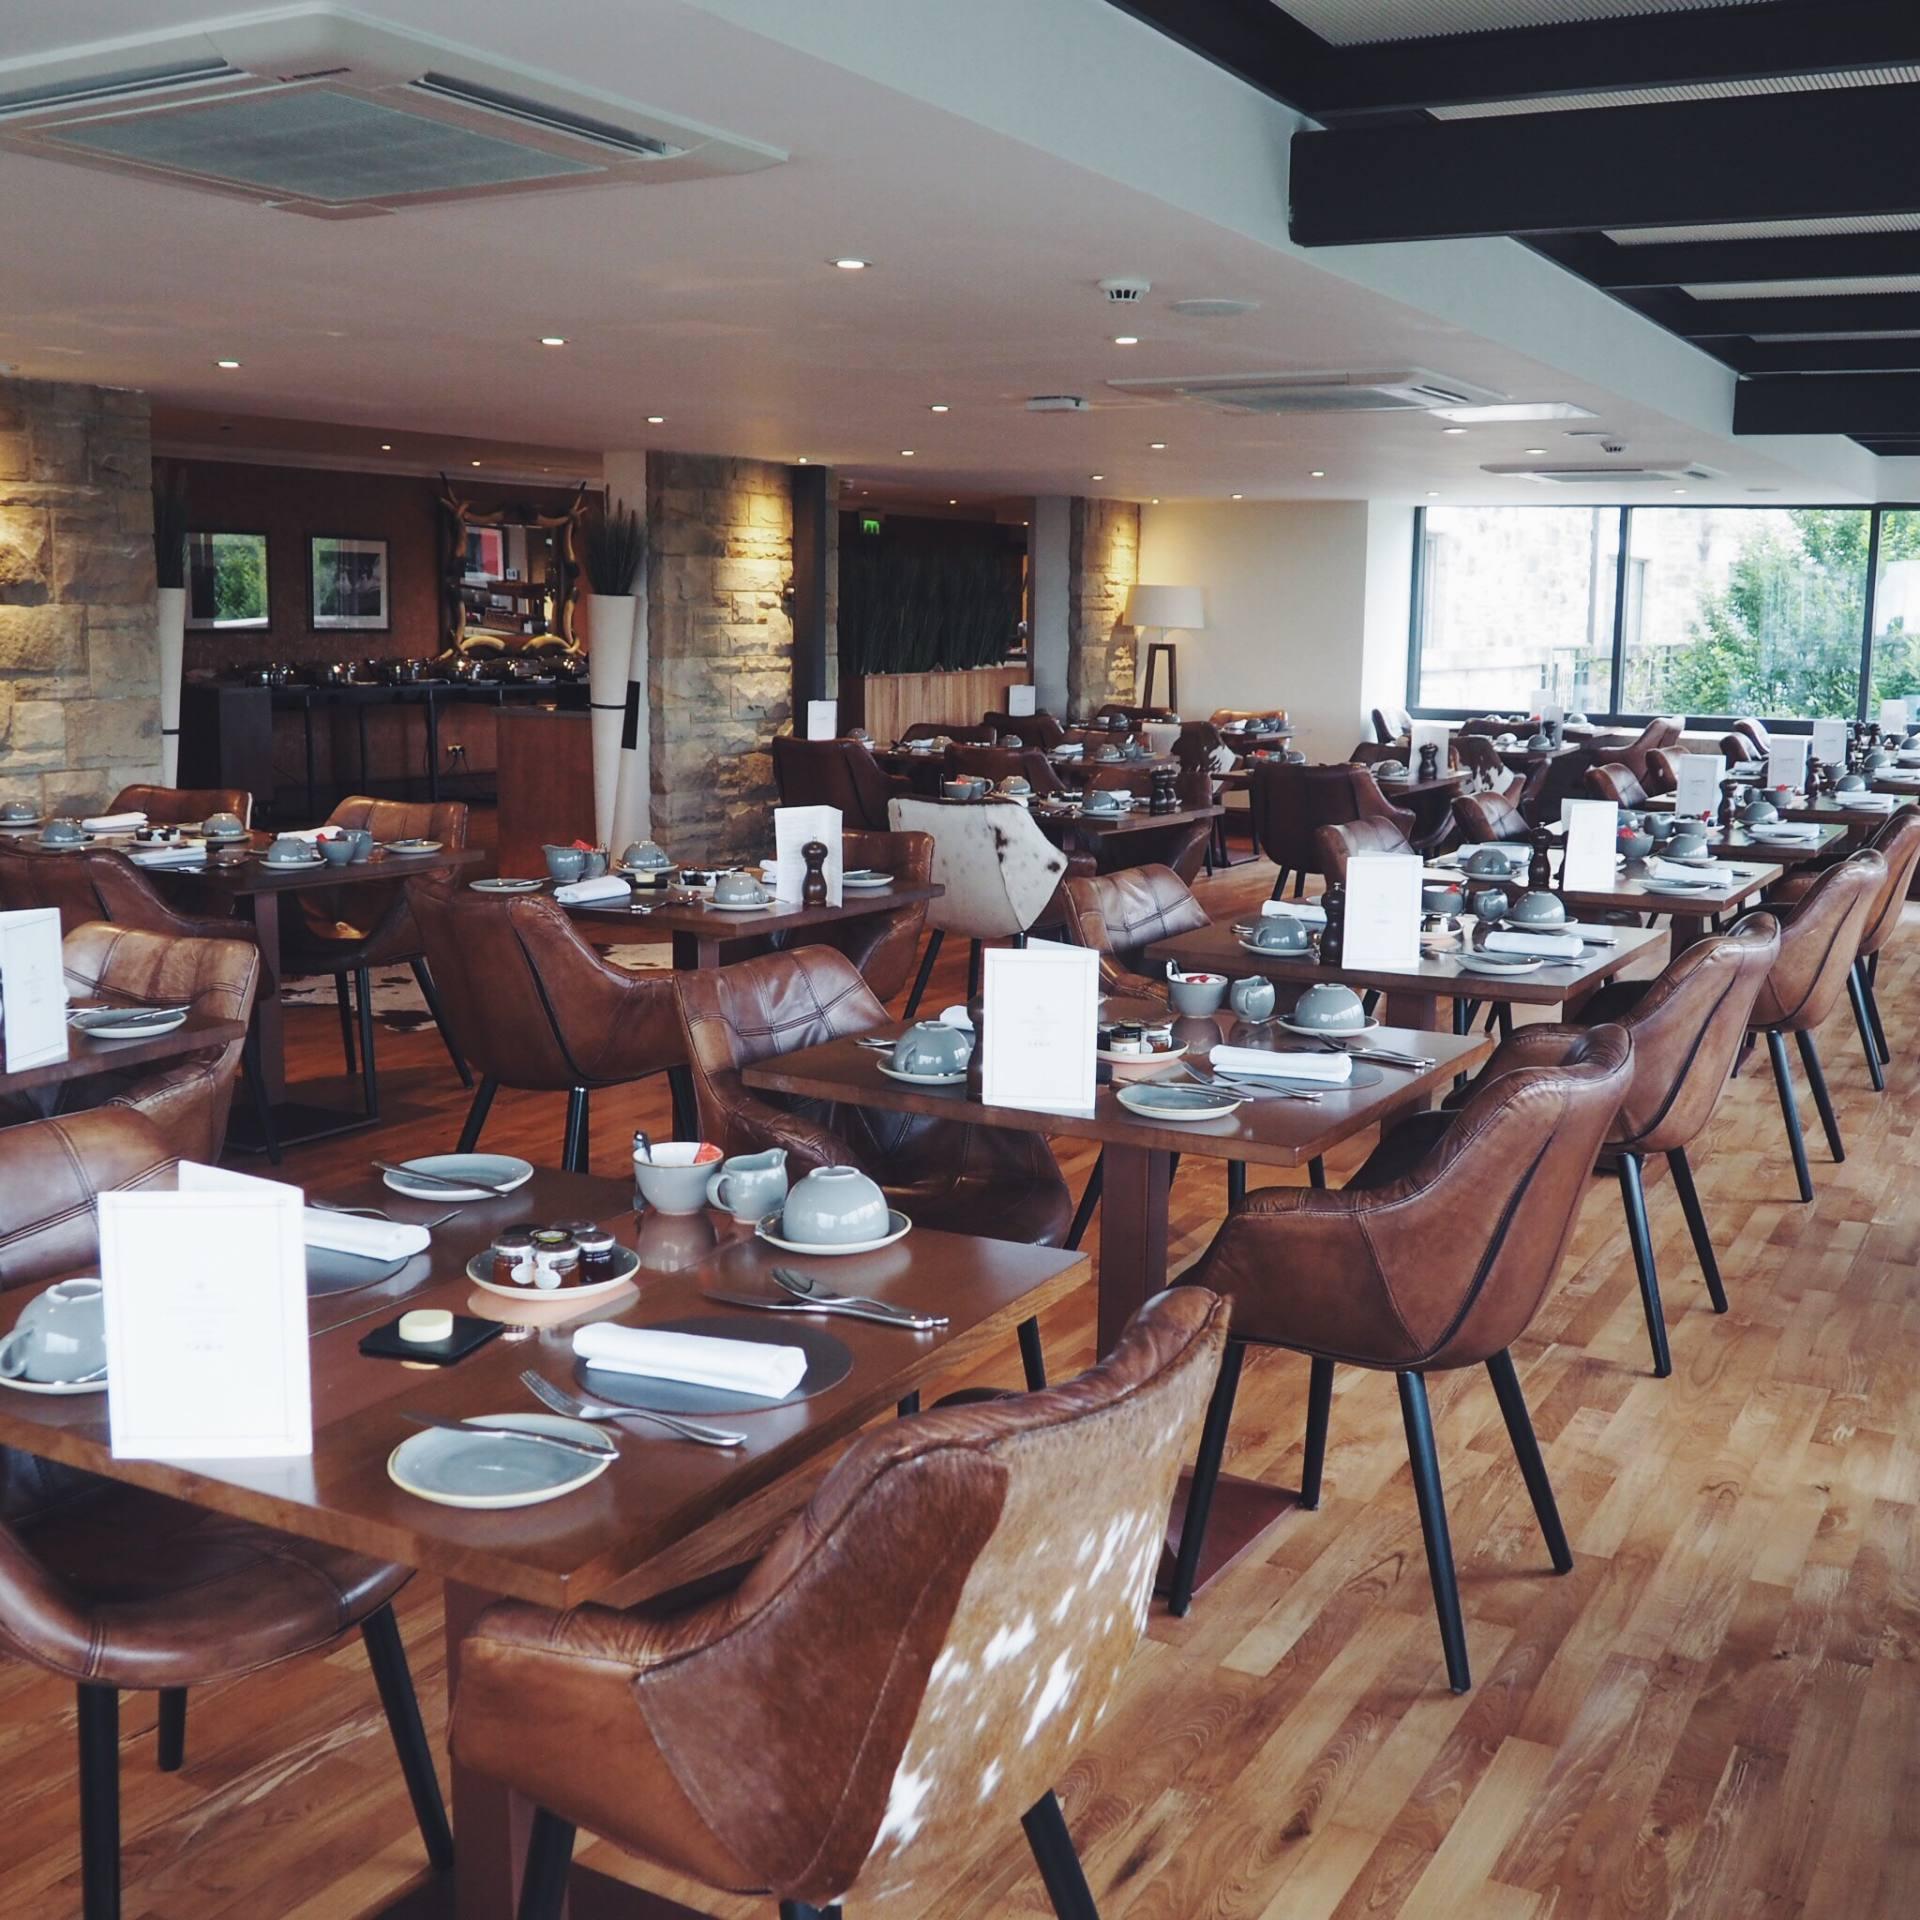 Steak at Six restaurant